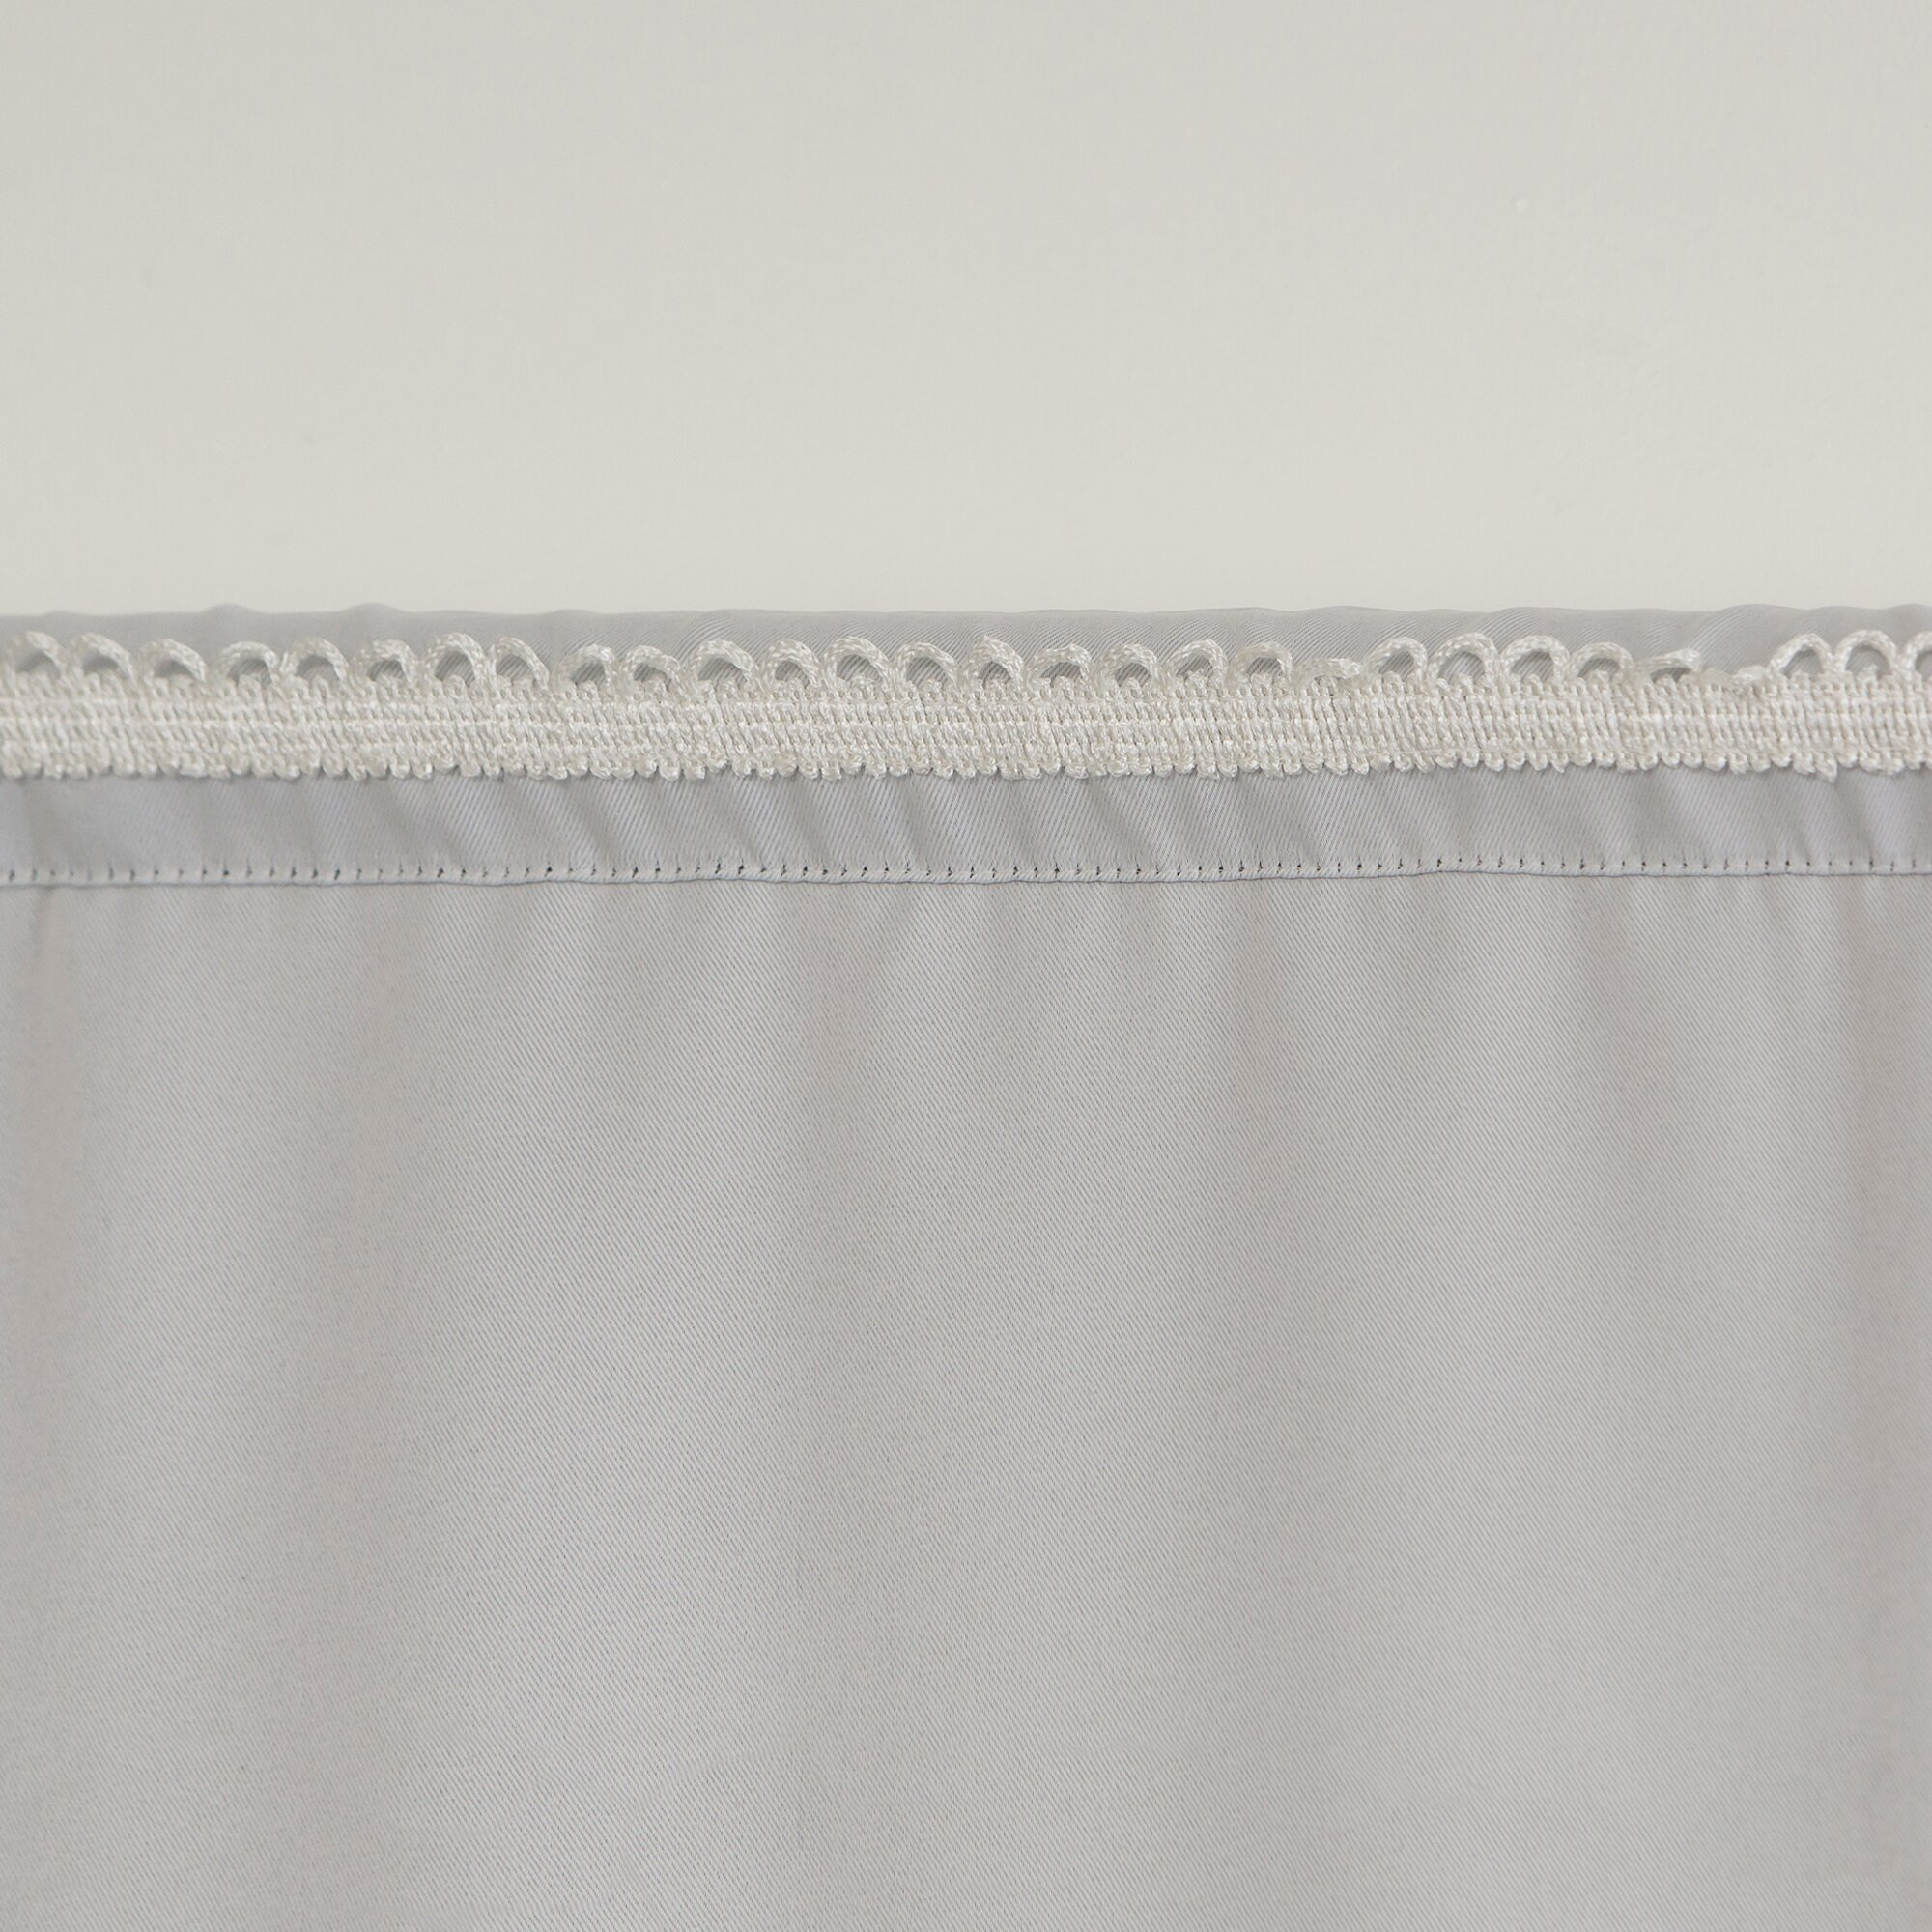 Best Home Fashion, Inc. Blackout Rod Pocket Curtain Liner